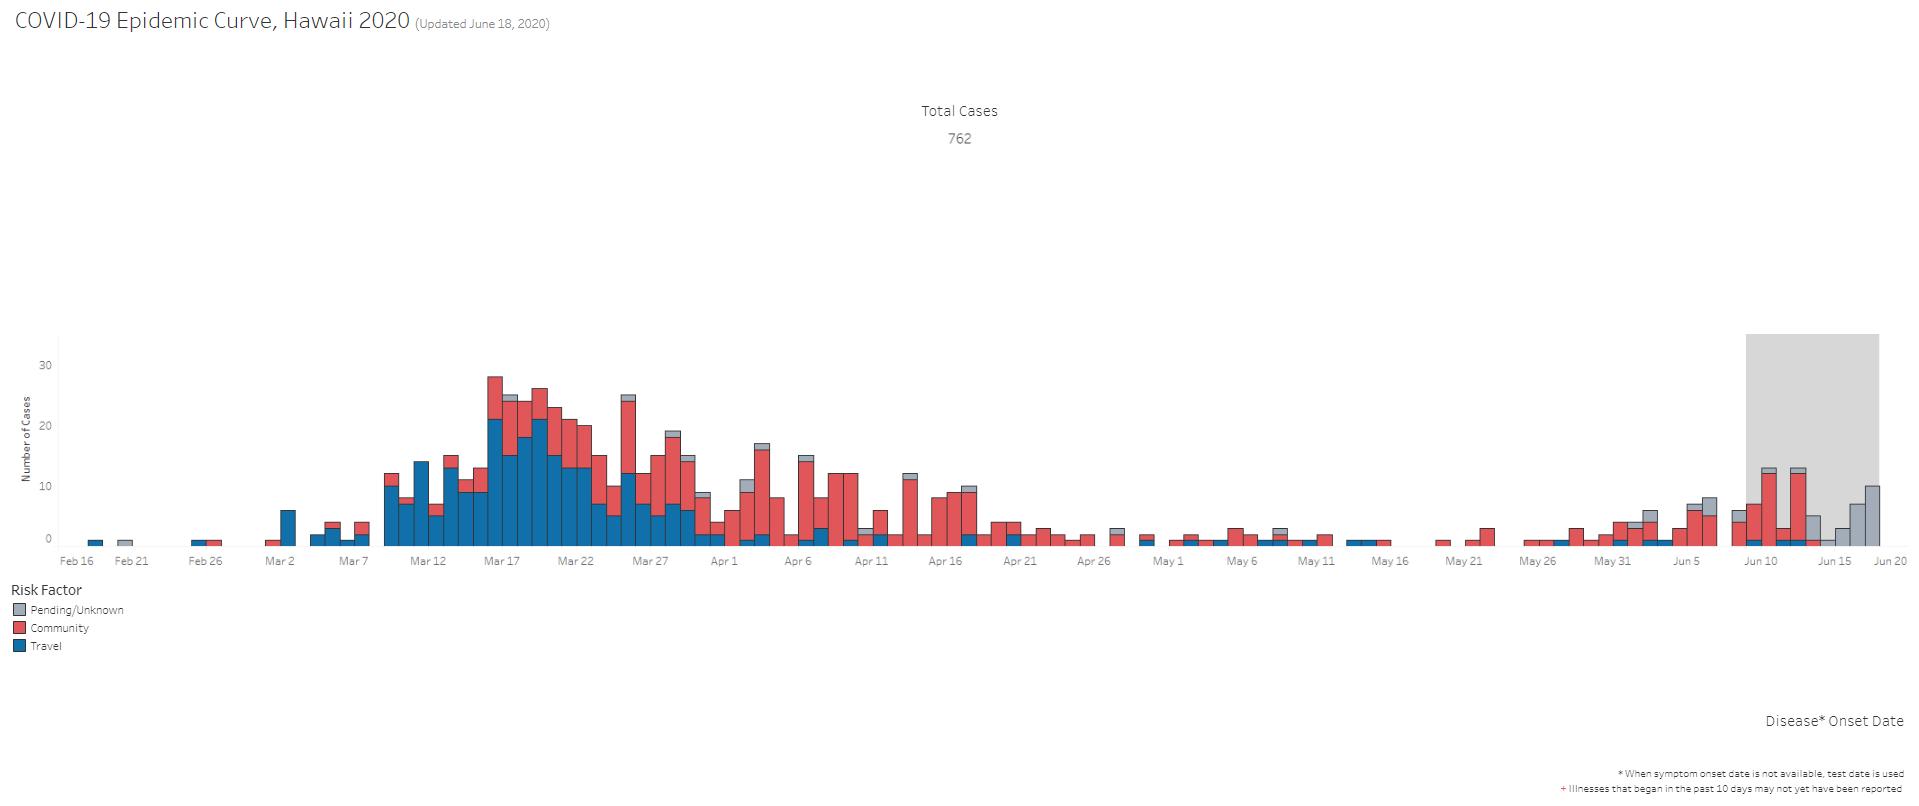 COVID-19 Epidemic Curve Updated June 18, 2020